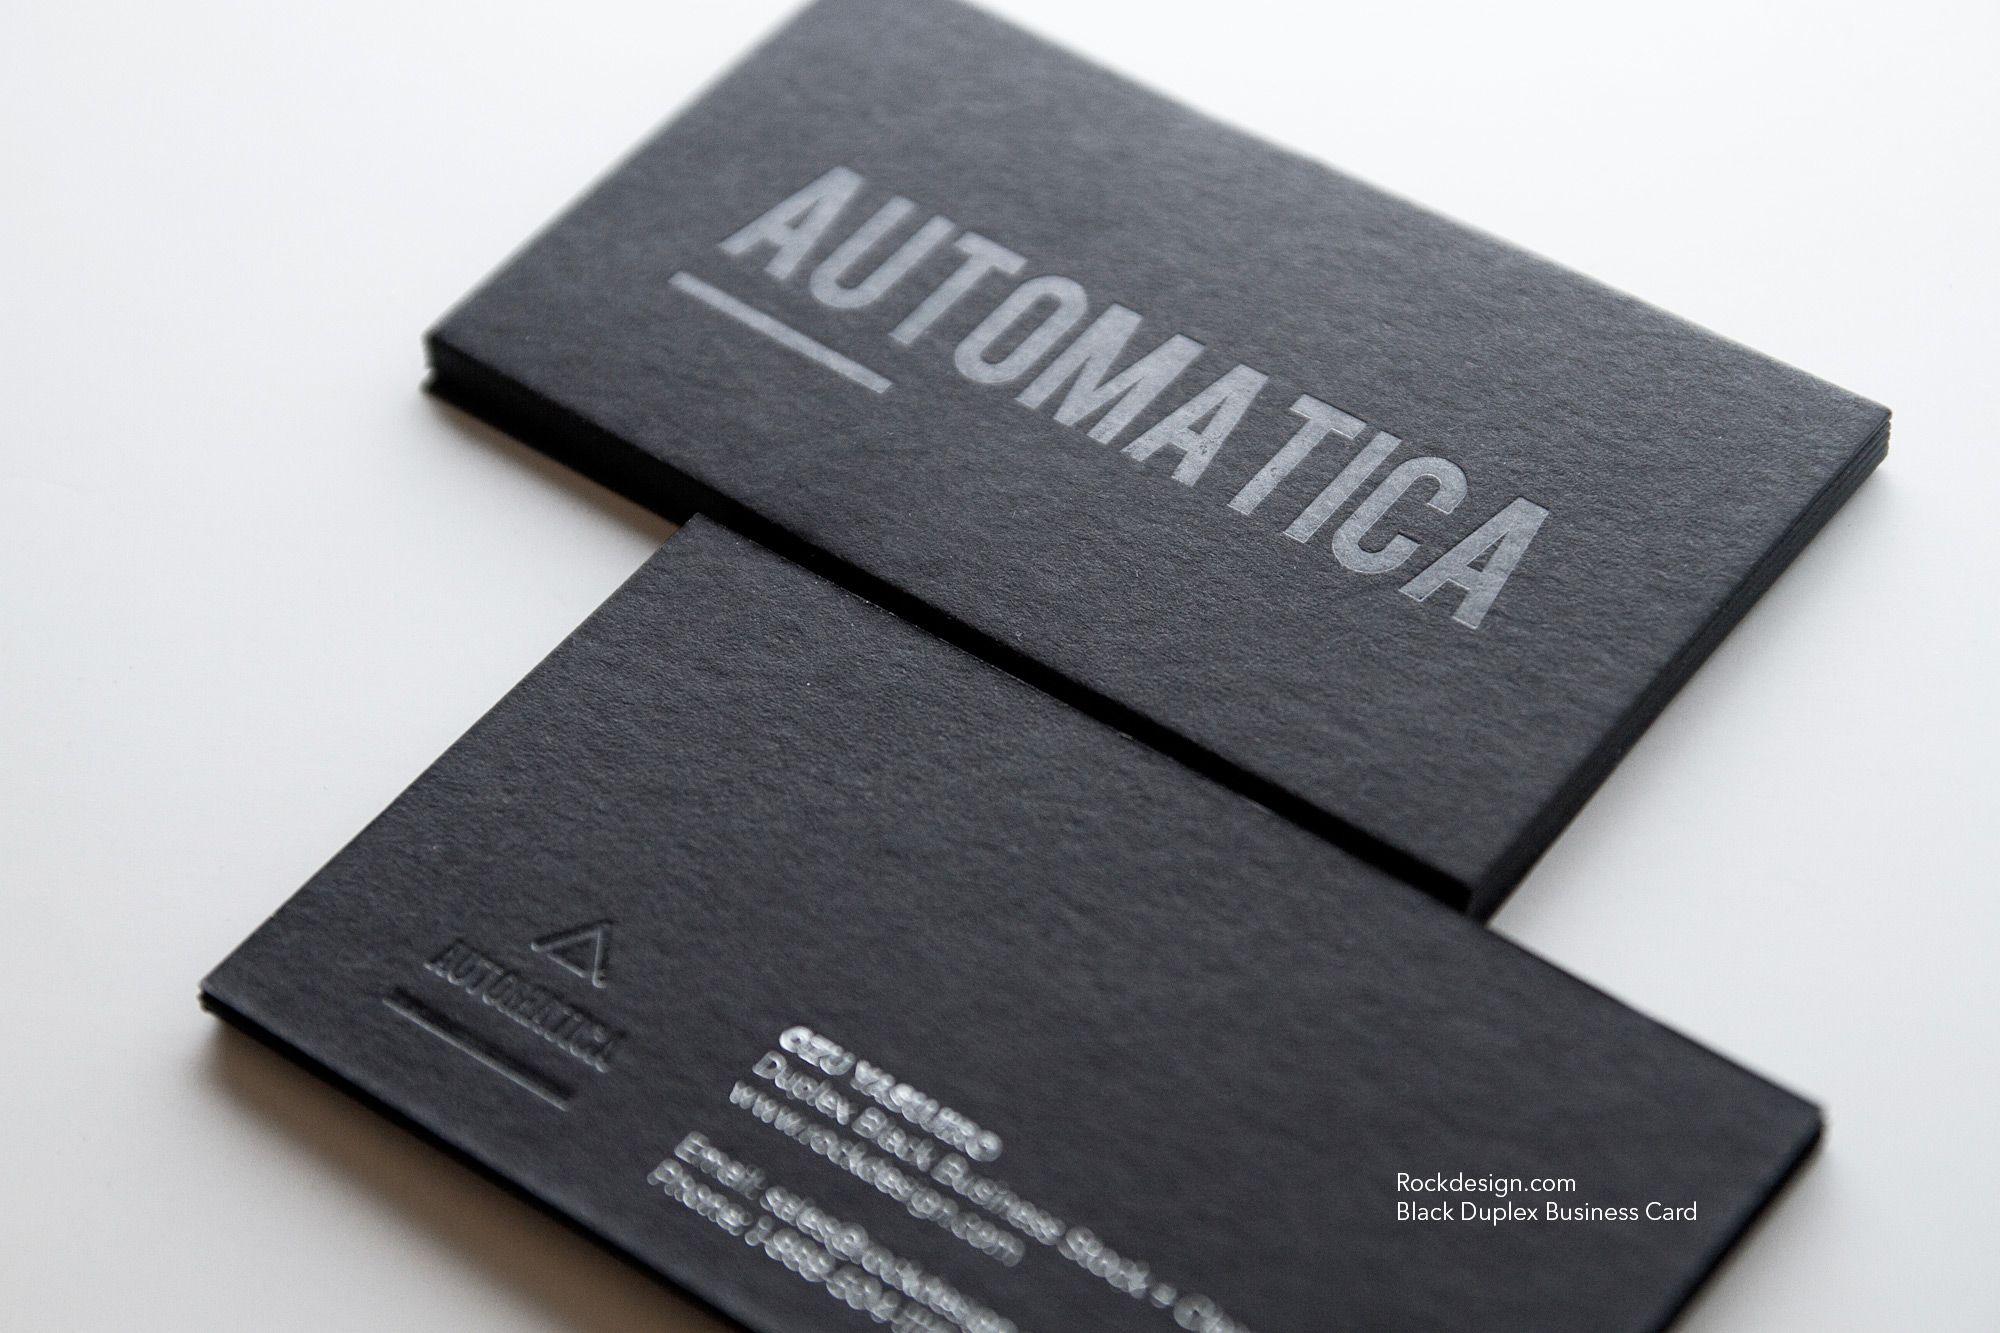 Black Duplex Business Card Clear Foil Clear Business Cards Foil Business Cards Letterpress Business Cards